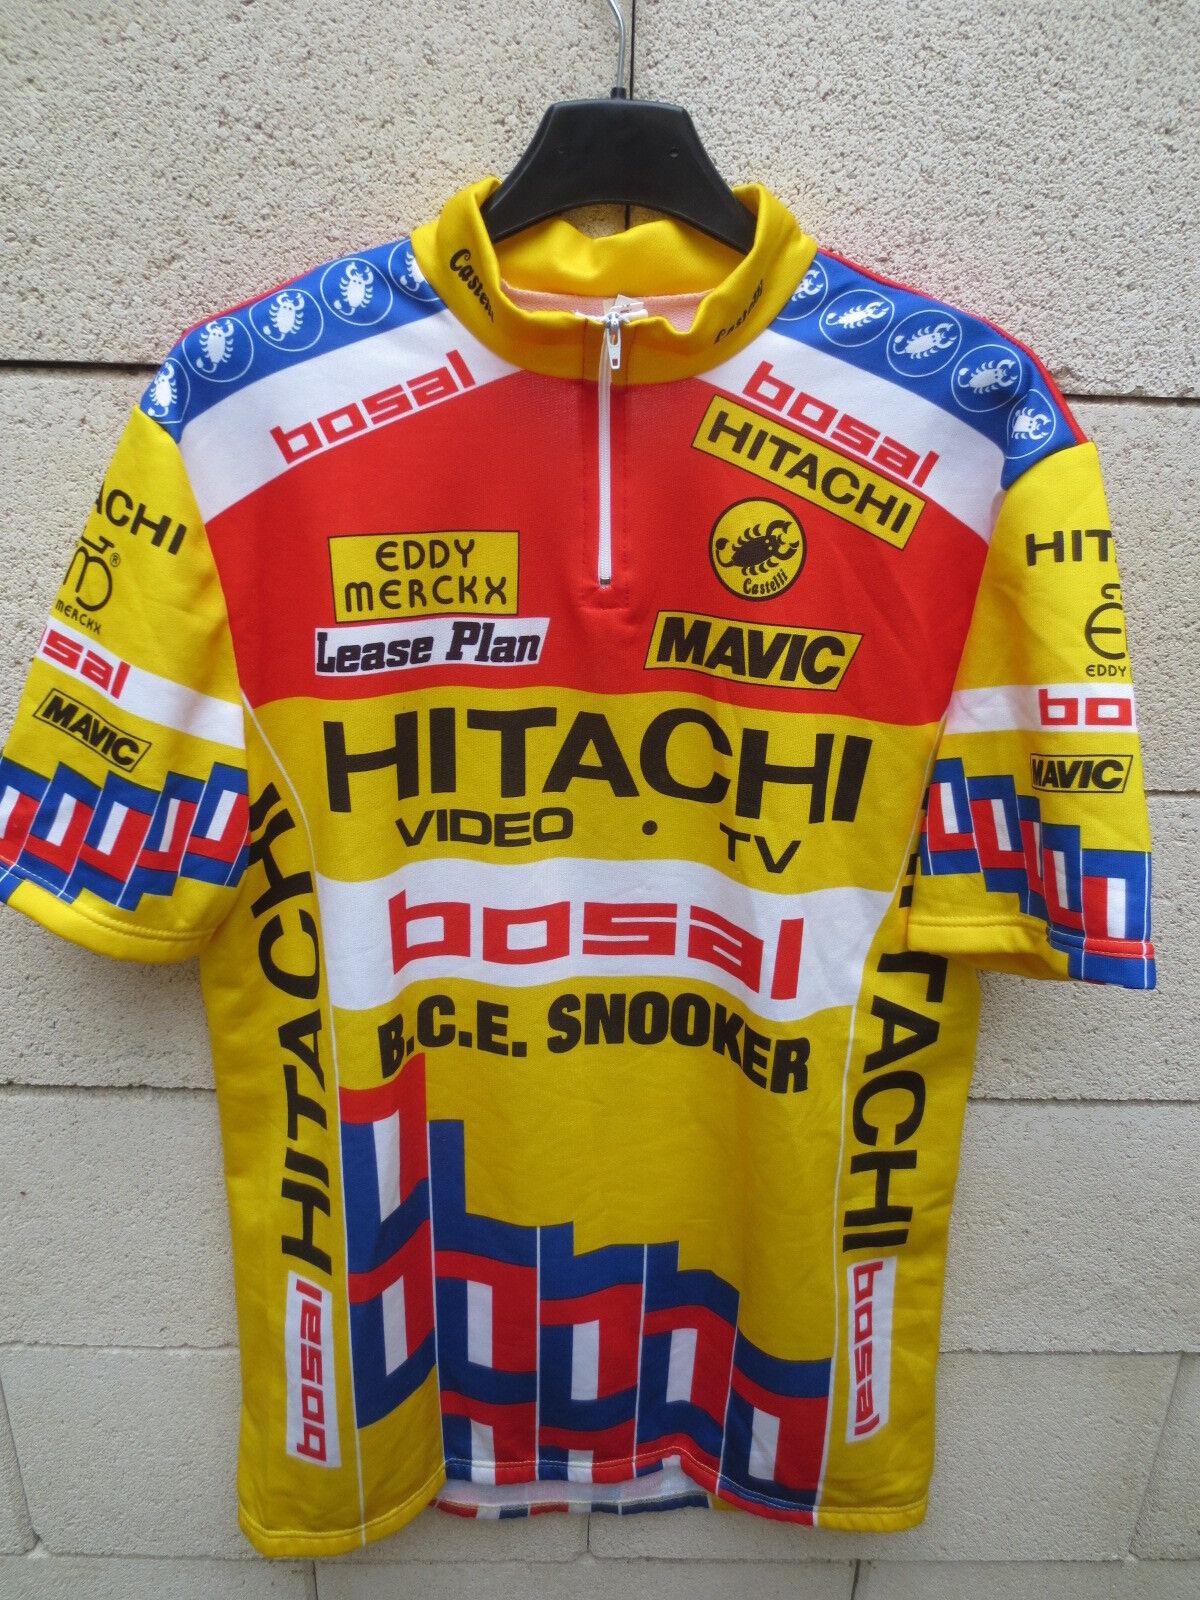 Vintage jersey hita  bosal B.C.E snooker tour  de france 1988 jersey leotard 6  order now enjoy big discount